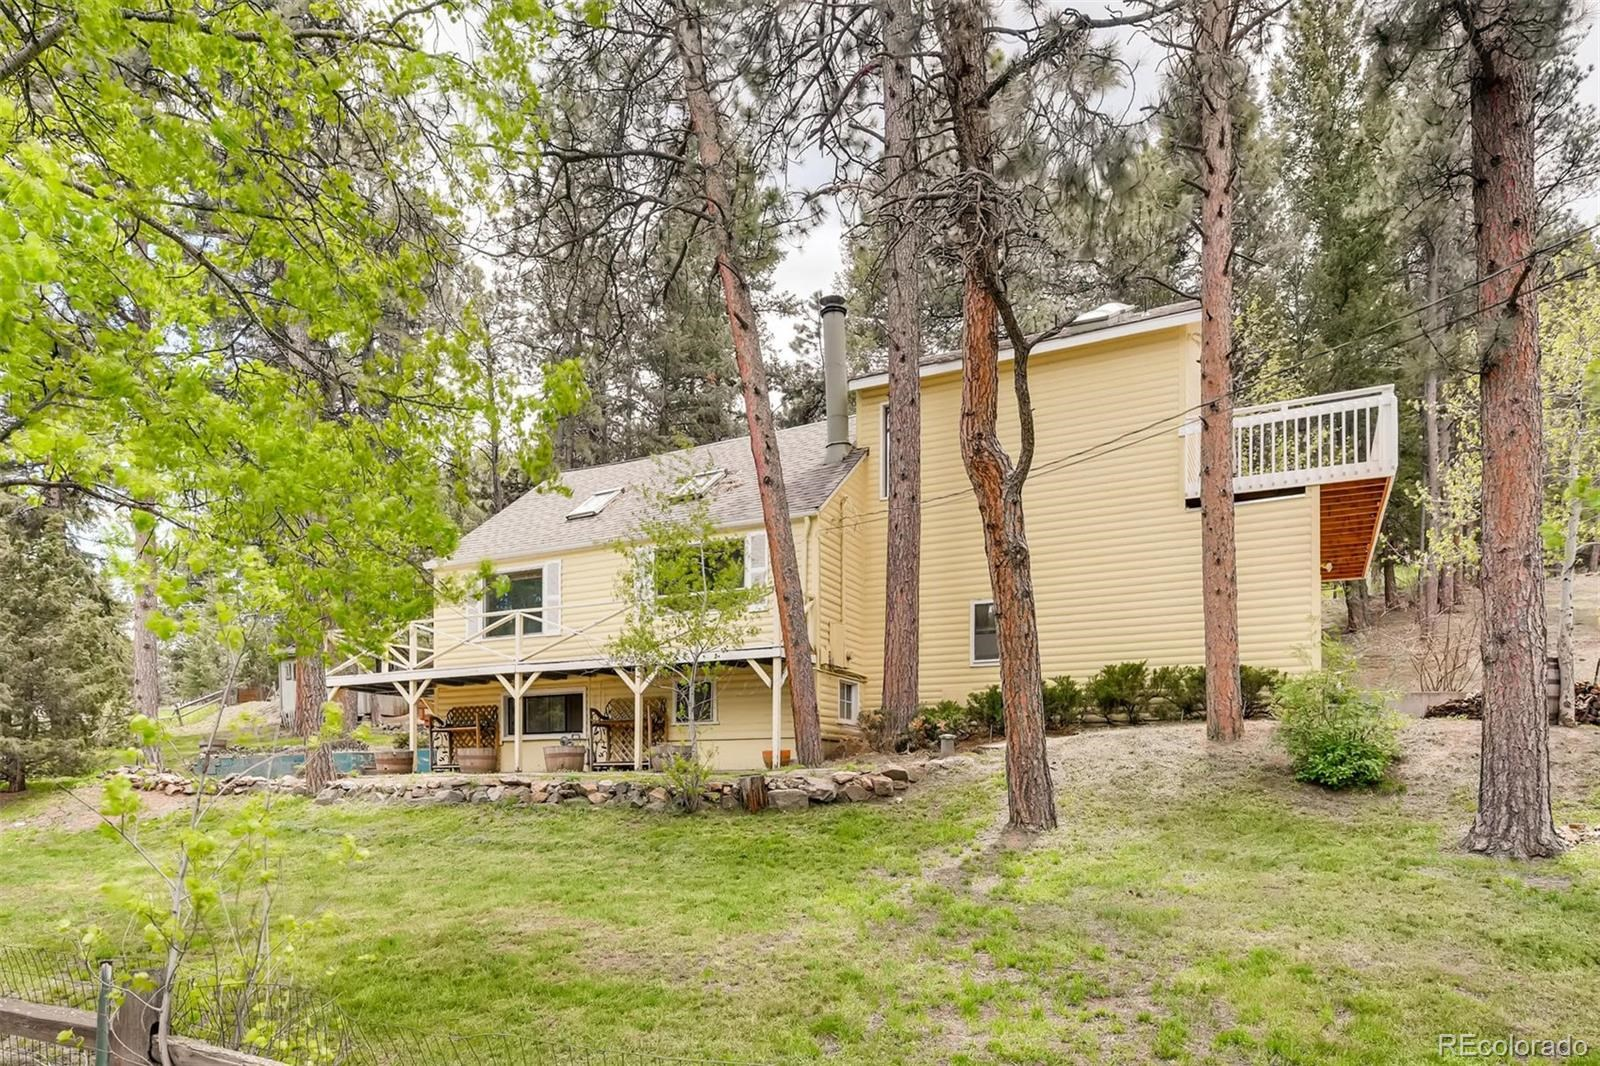 MLS# 4457487 - 20 - 23194 Otowi Road, Indian Hills, CO 80454